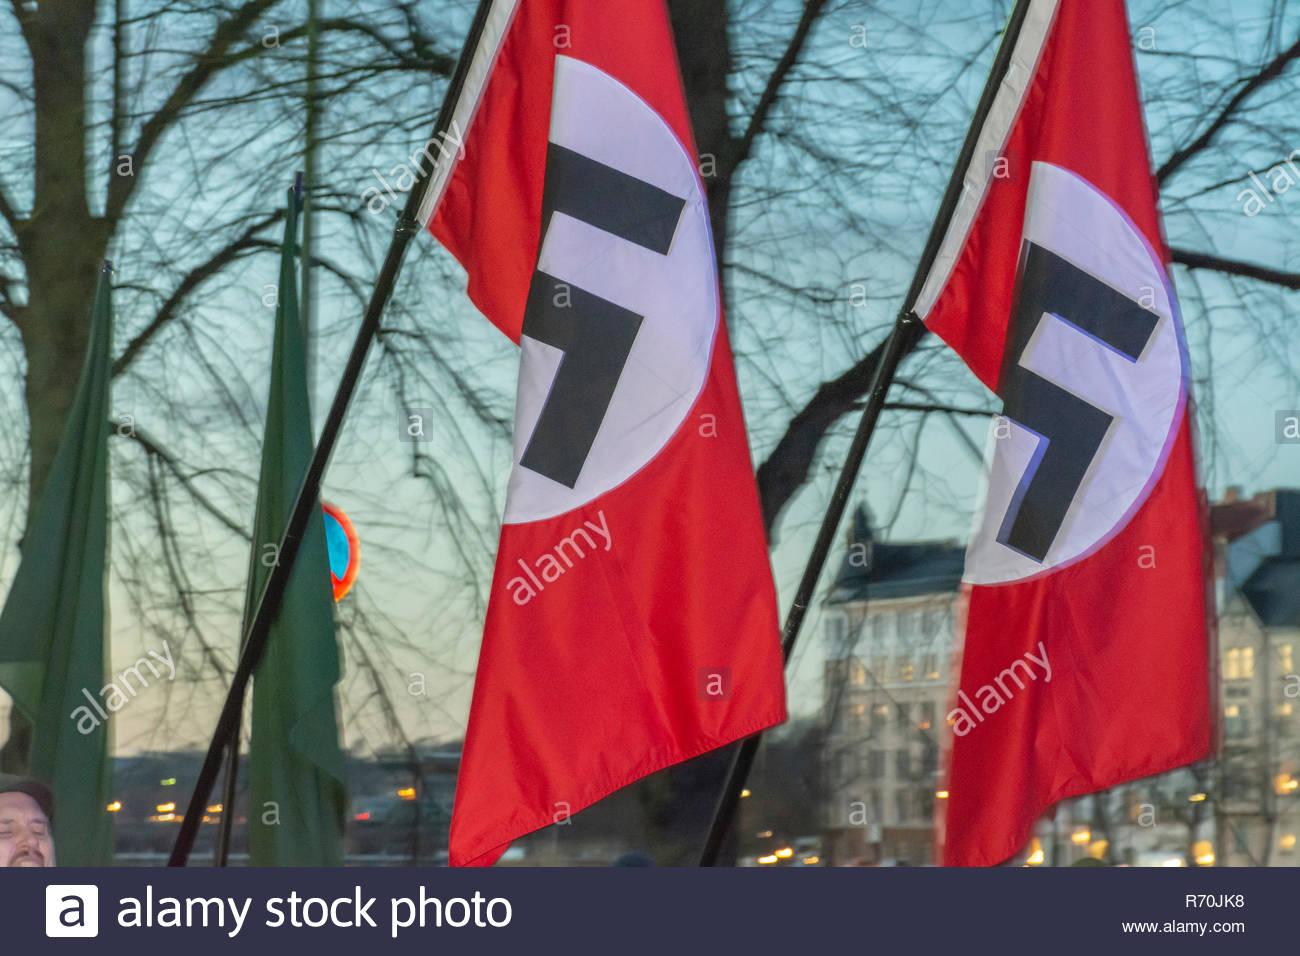 Helsinki, Finland. 6th Dec 2018. Banned Neo Nazi Organisation Nordic Resistance Movement waving Nazi flags at demonstration on Independecce Day of Finland Credit: Pekka Liukkonen/Alamy Live News Stock Photo